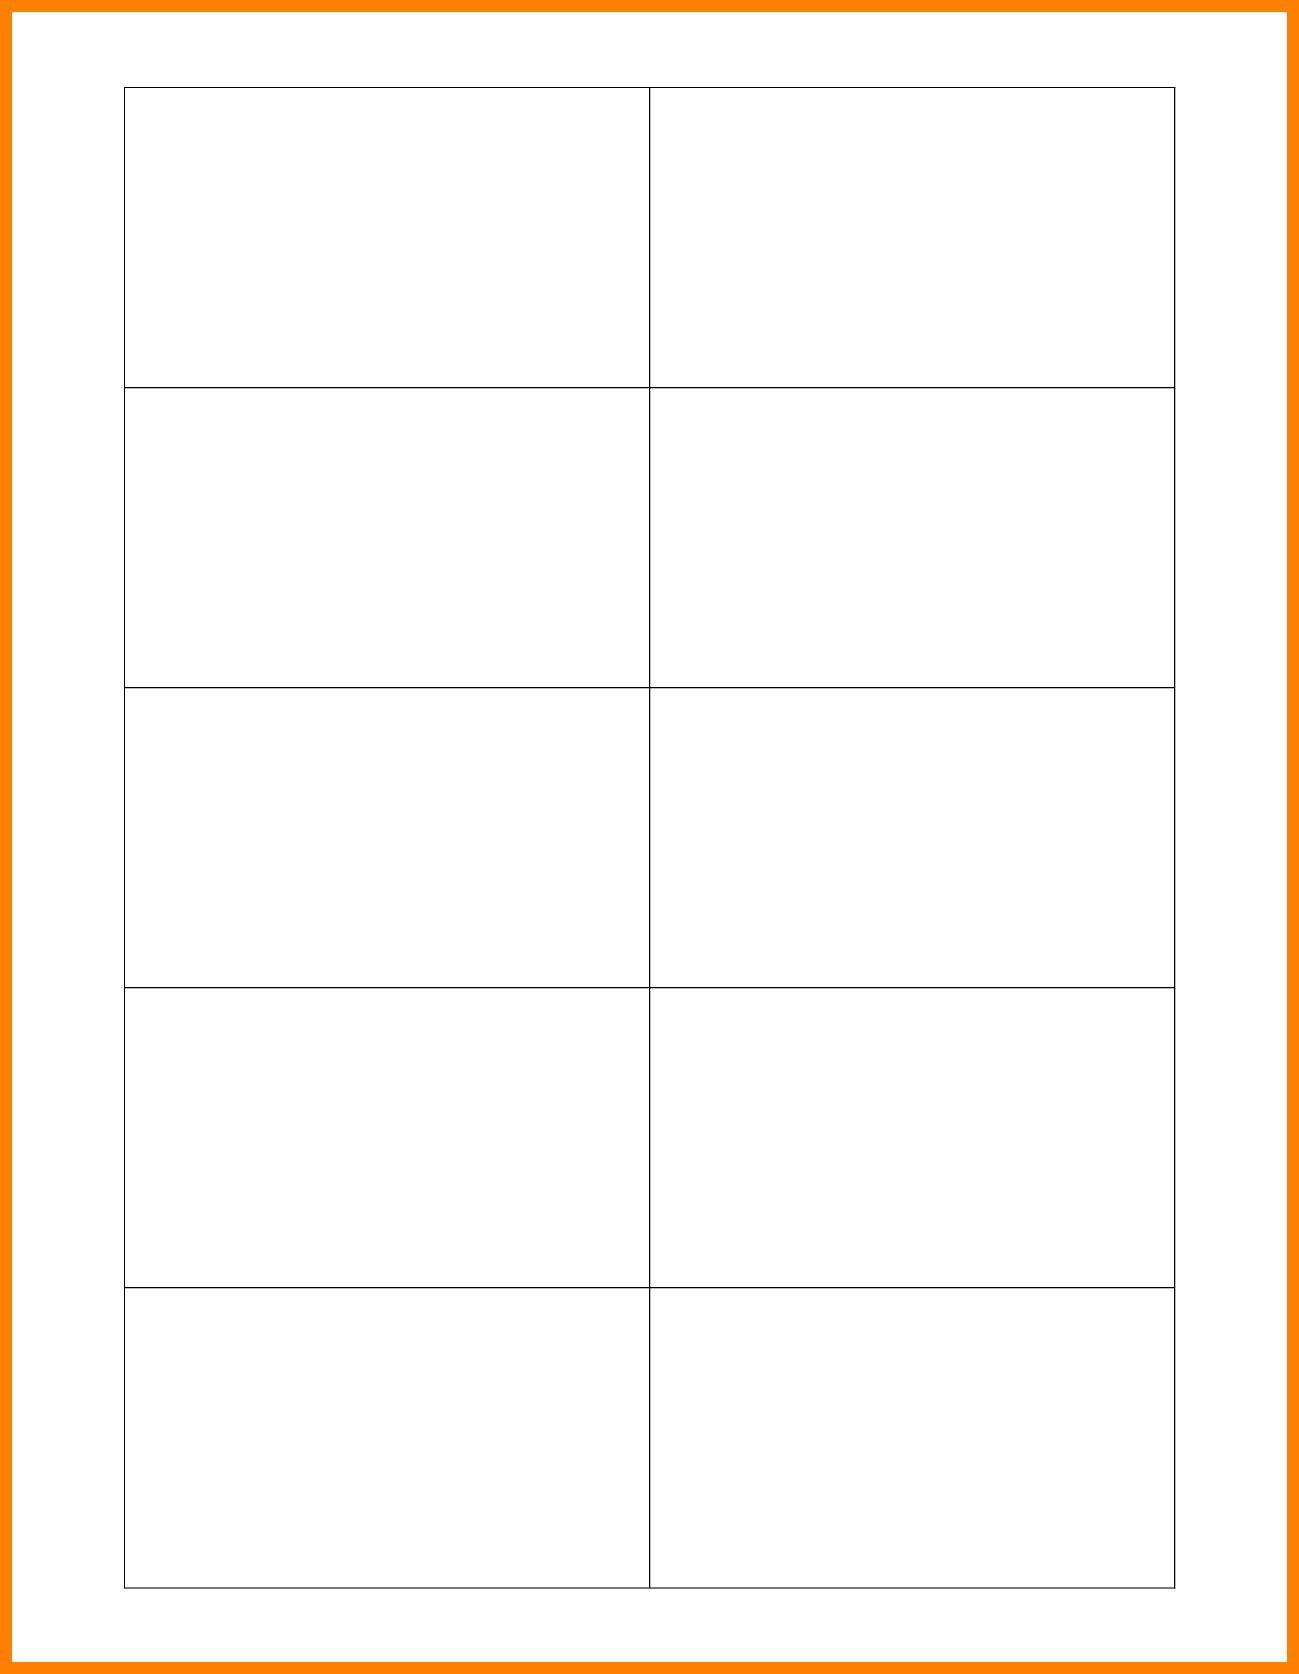 Pinanggunstore On Business Cardsbusinesscardsdesignideas Regarding Free Blank Business Card Template Word